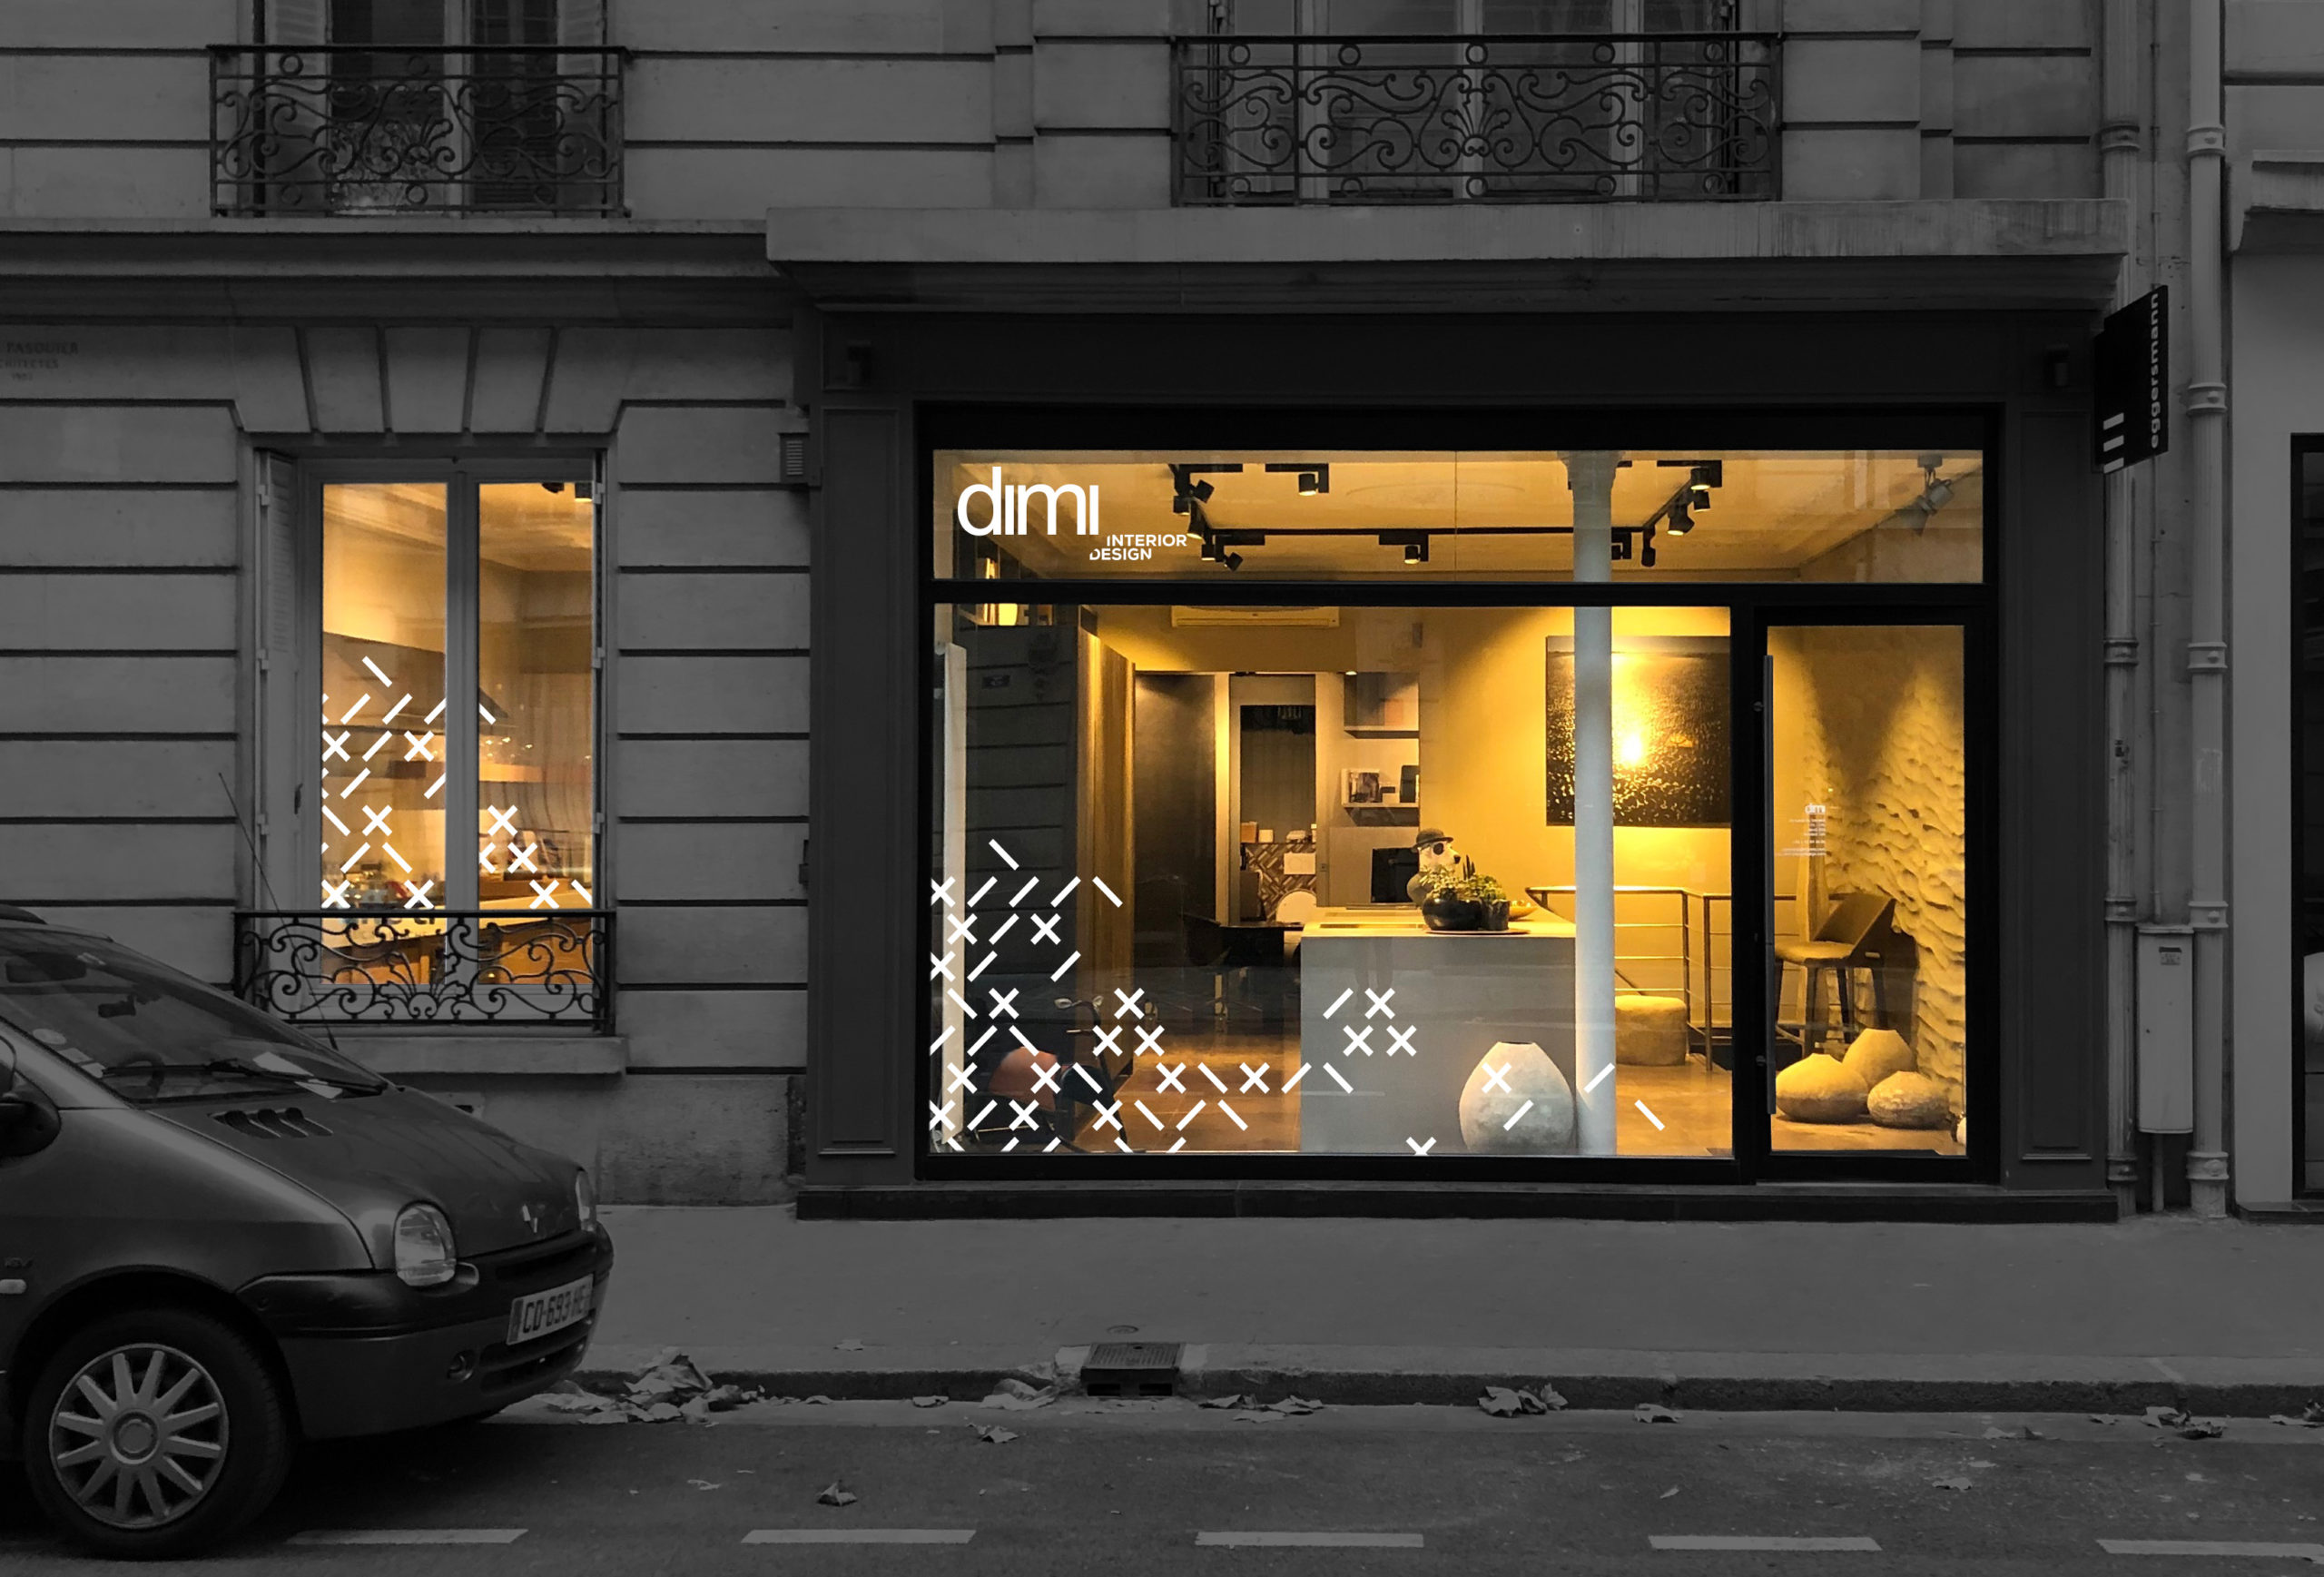 Dimi interior Design - Identité visuelle - Damien Rossier Graphisme